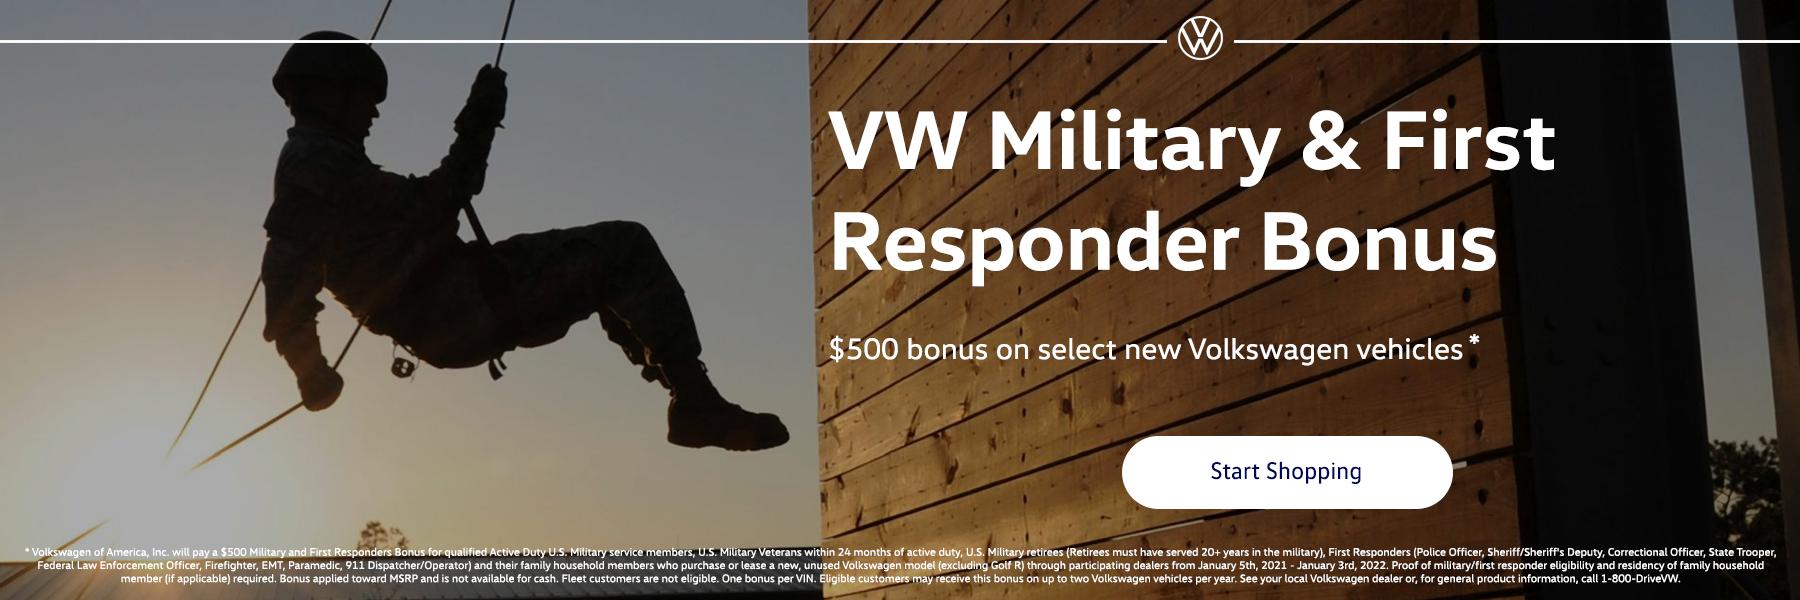 Volkswagen Military and First Responder Bonus